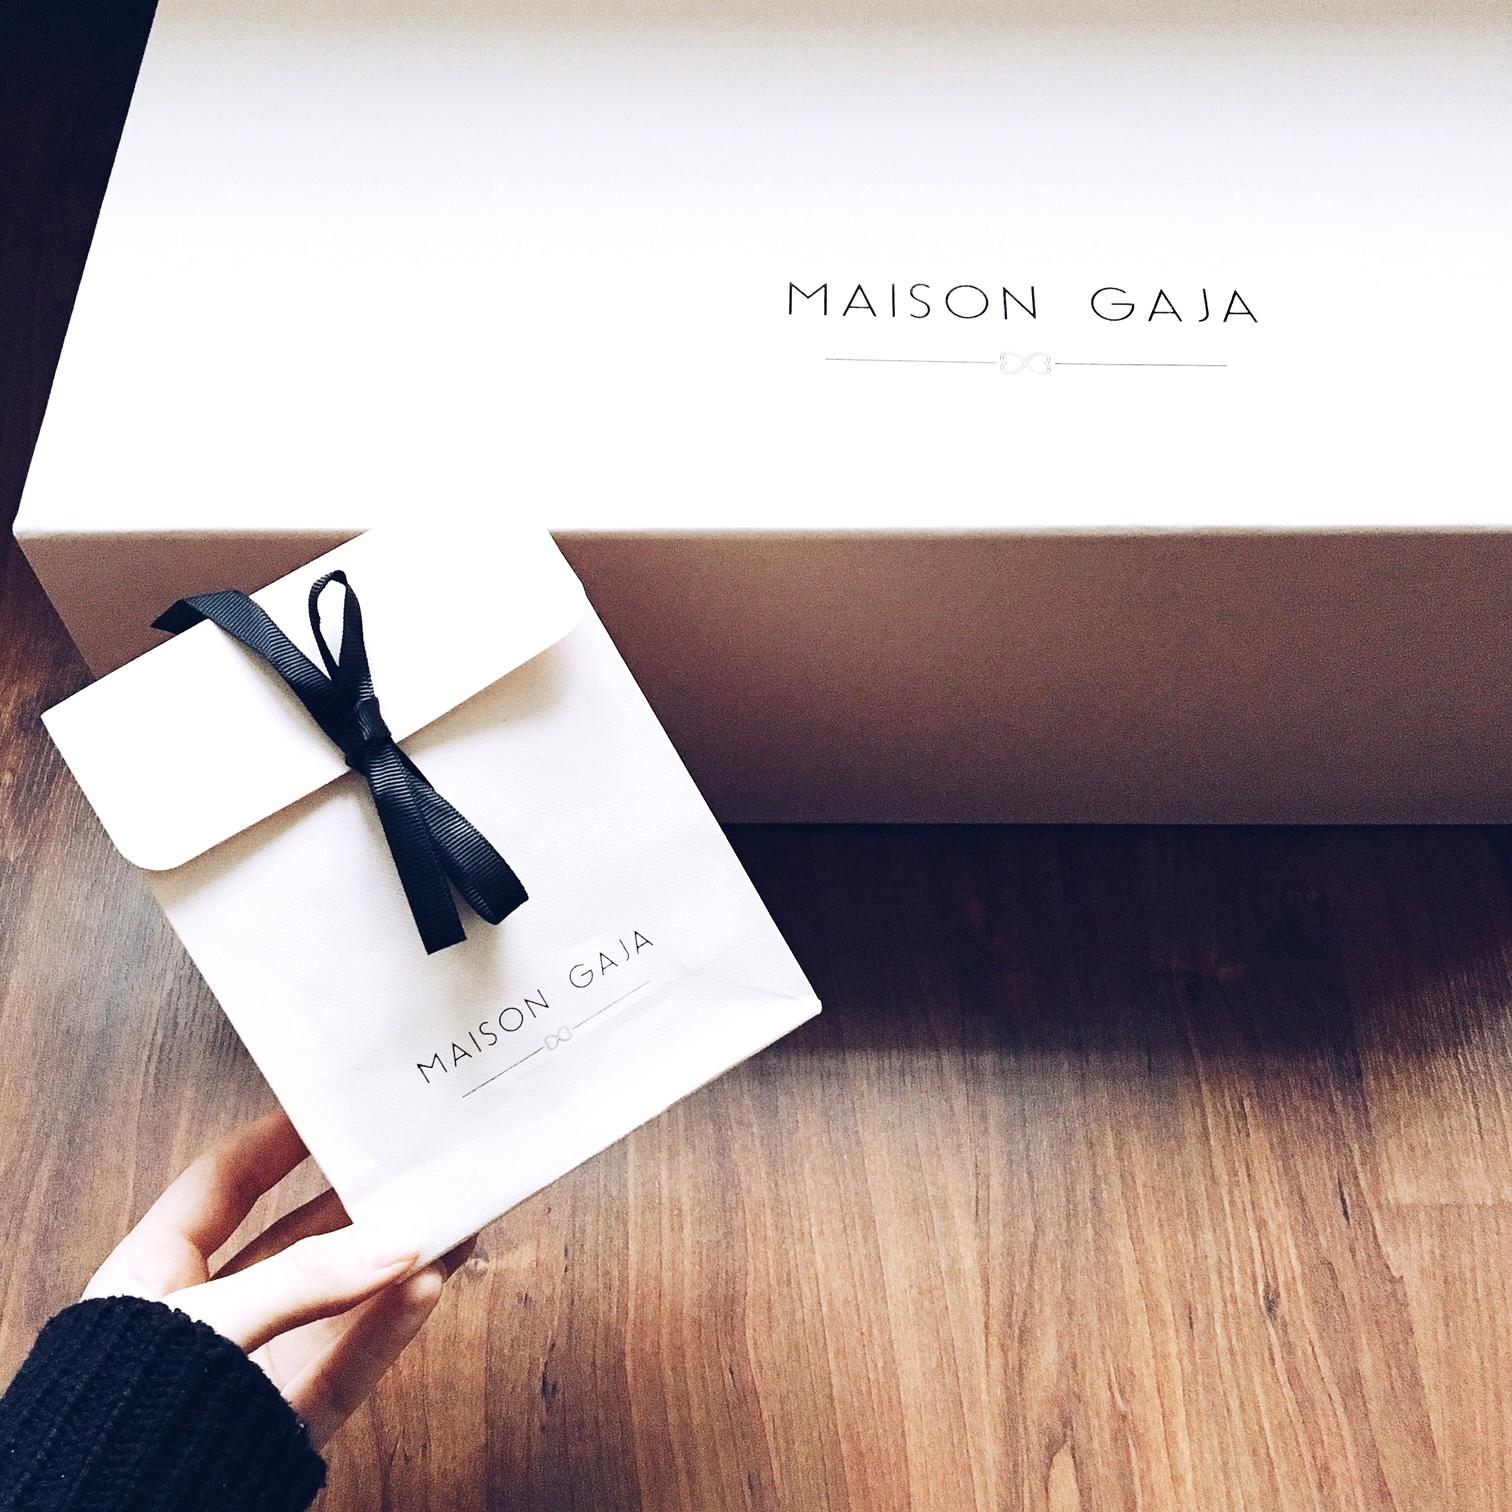 maison-gaja-packaging